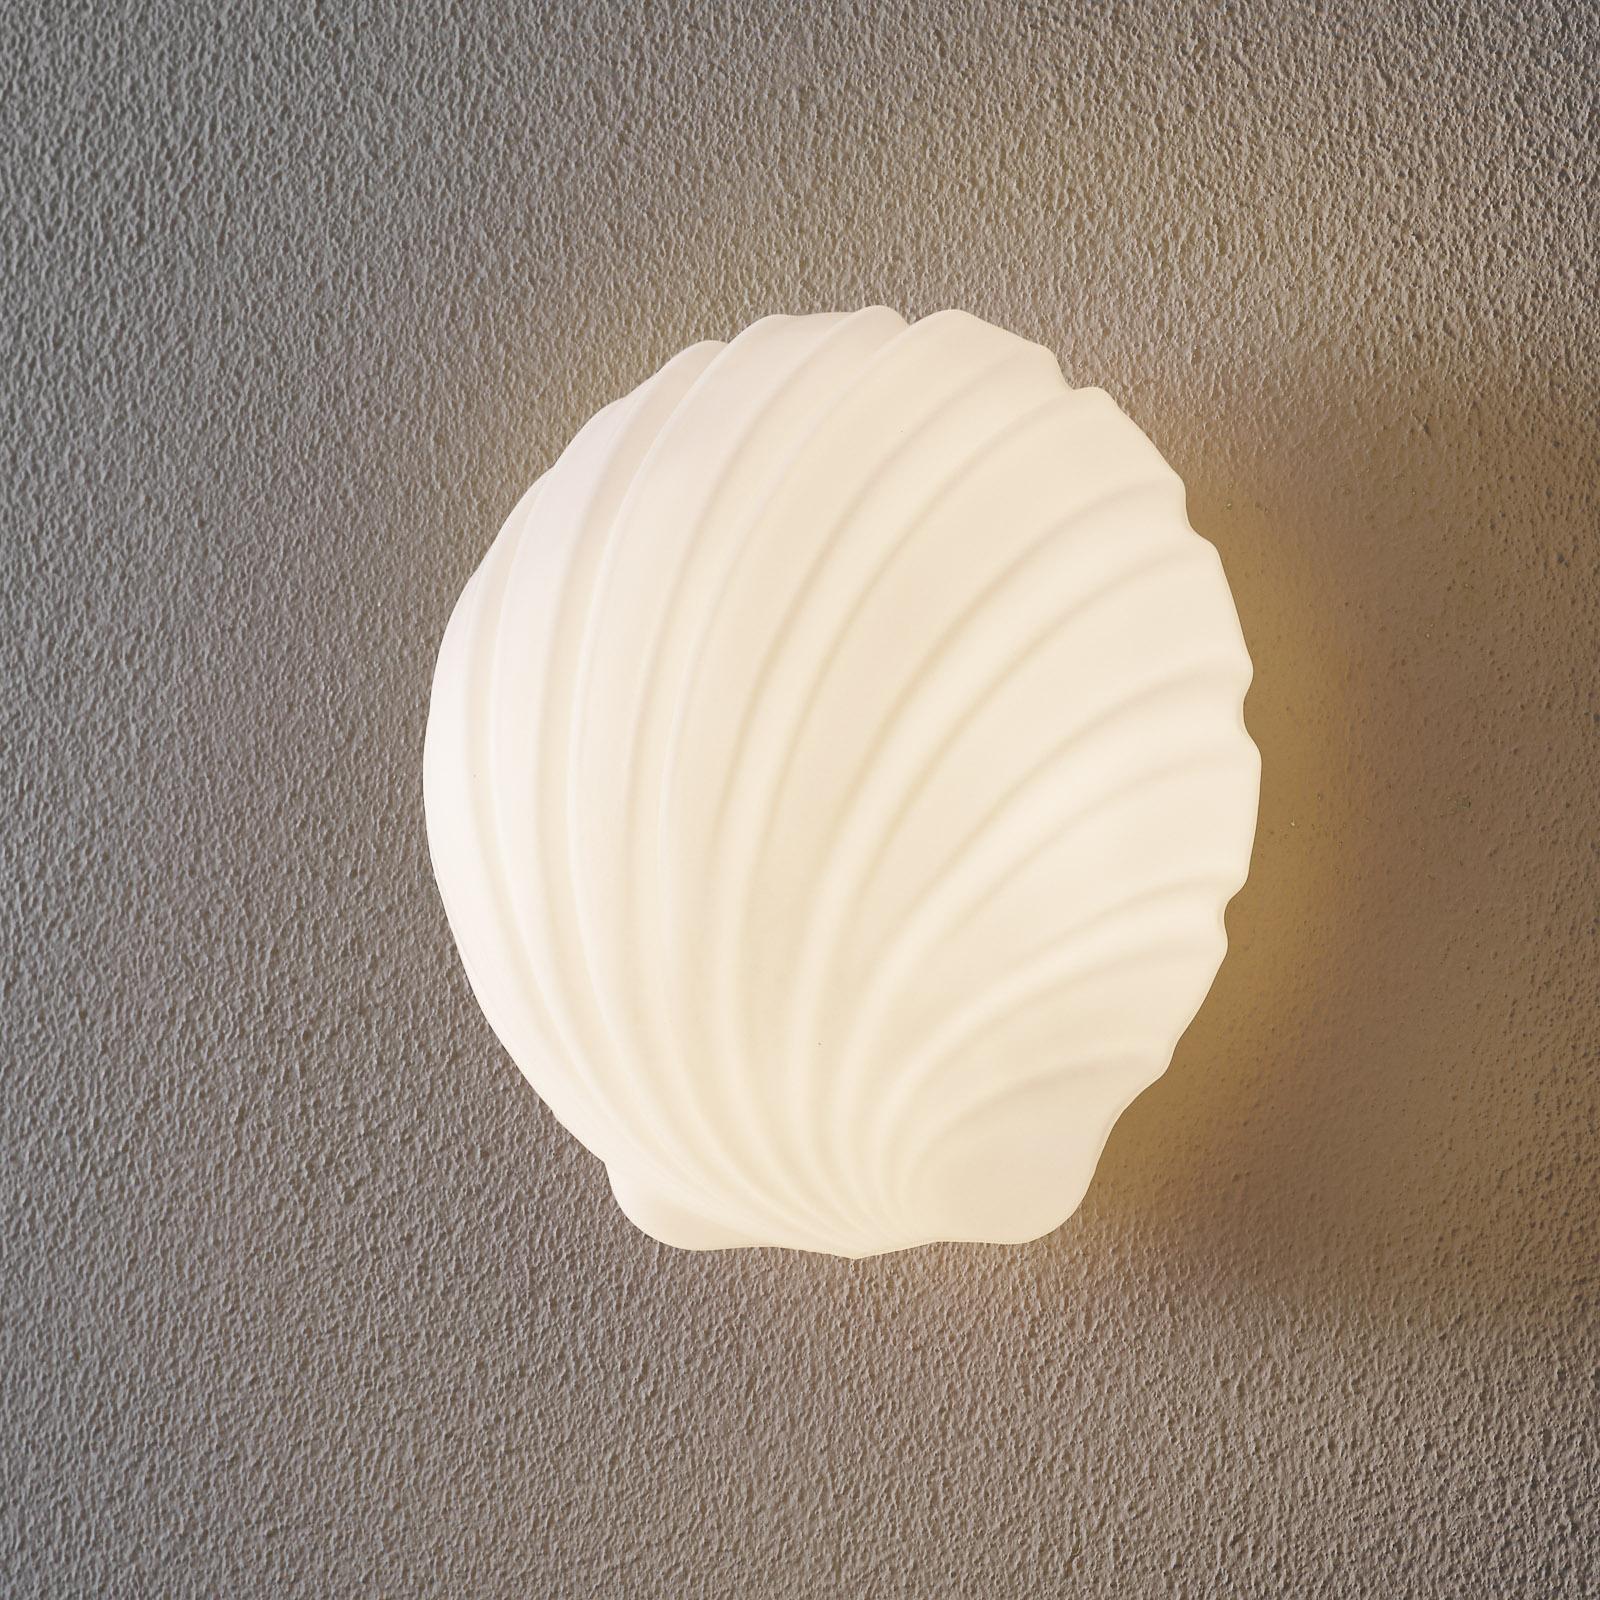 Mydi væglampe i glas